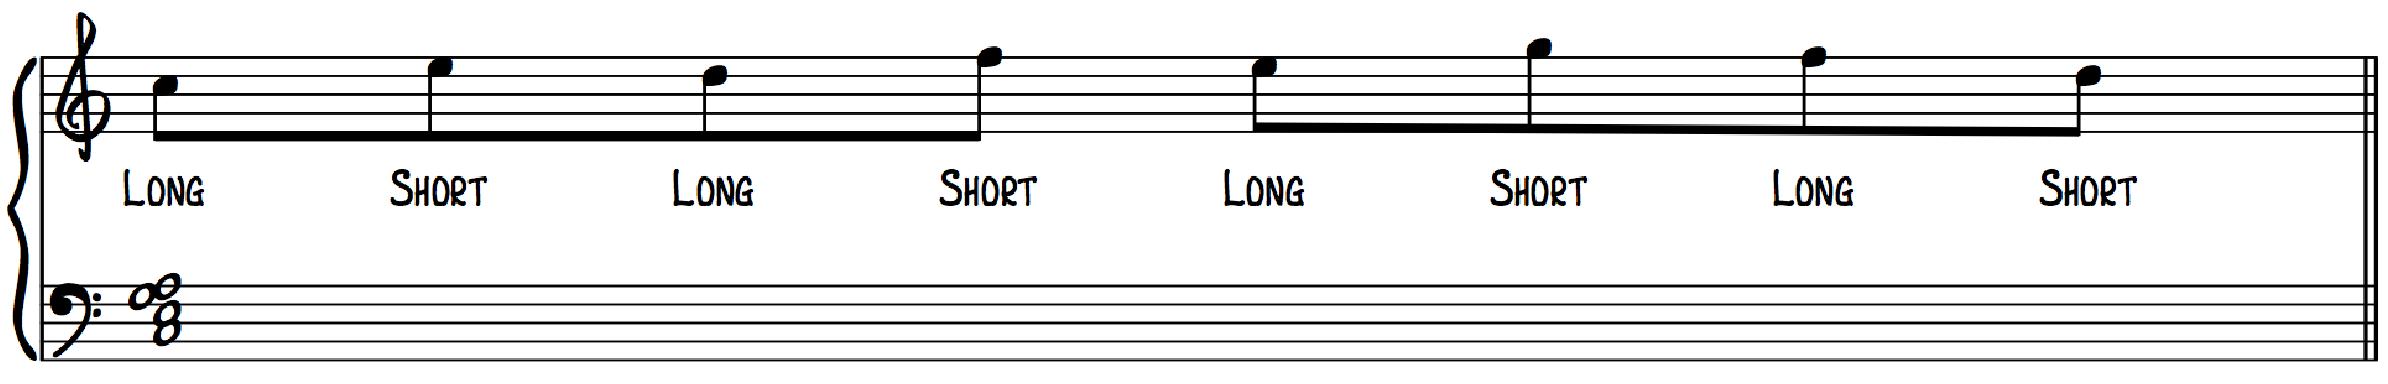 Jazz Swing Feel Exercise 1 for Jazz Piano Beginner Intermediate Advanced